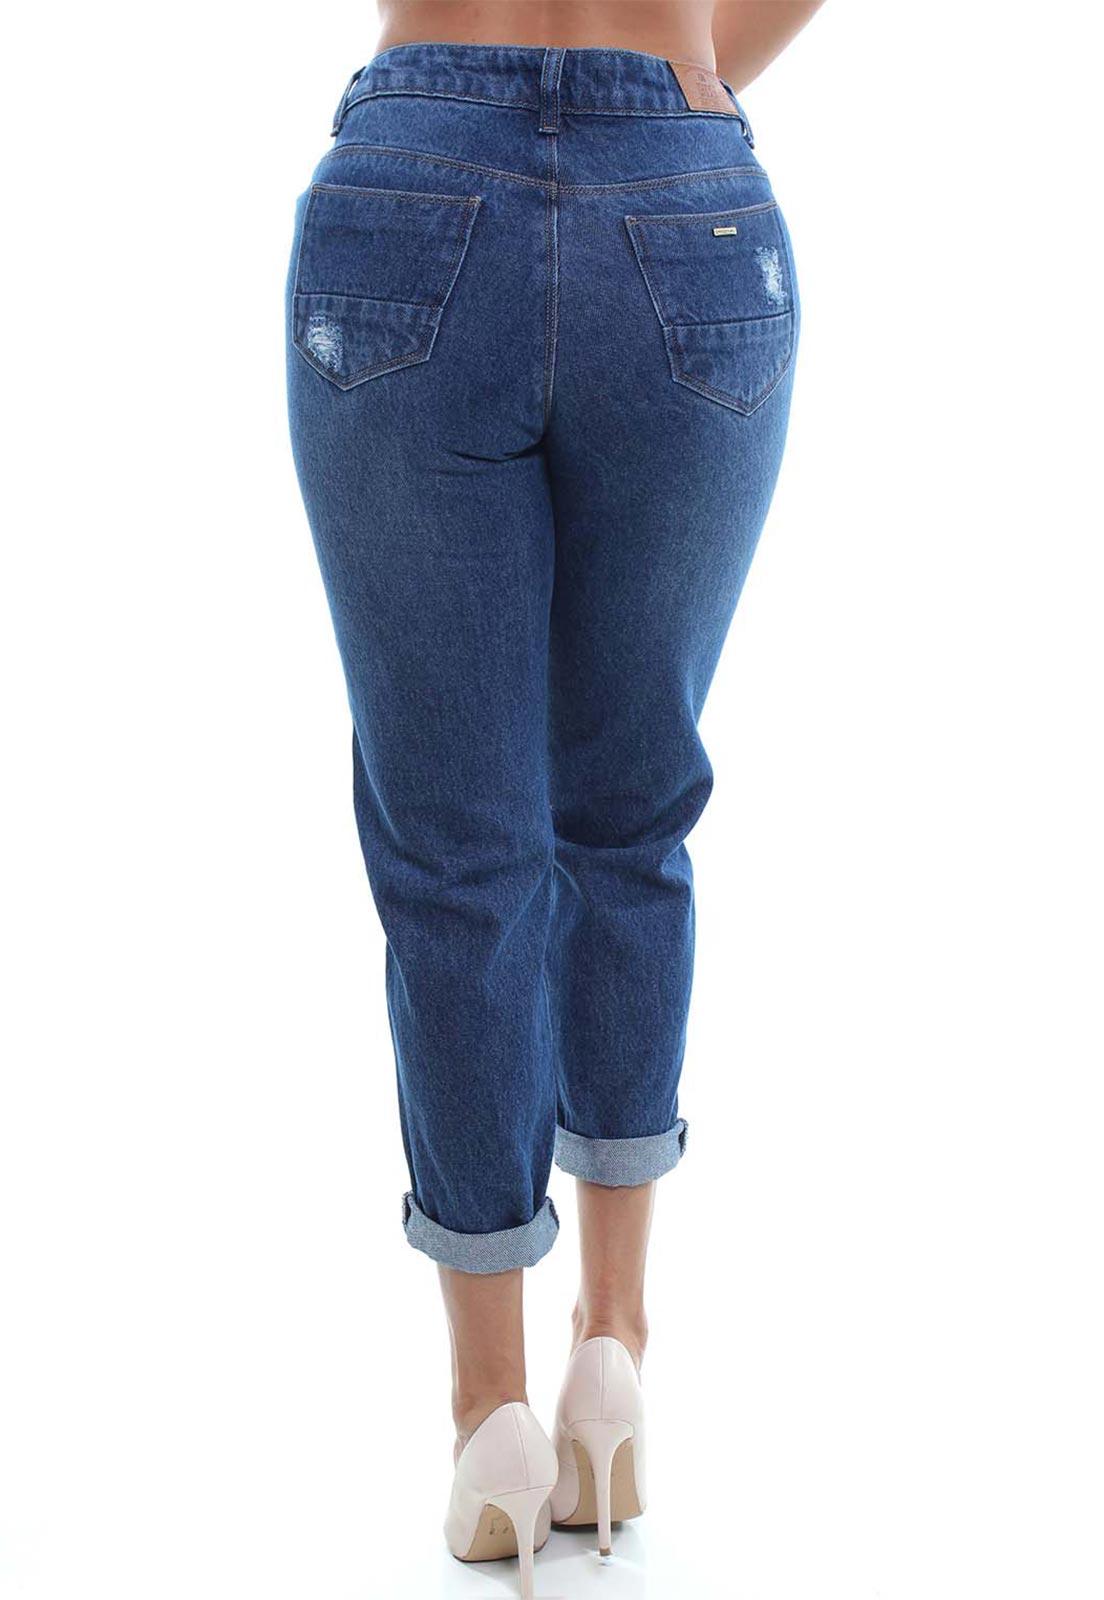 Calça  Jeans Feminina Mom Fit Crocker - 48072  - CROCKER JEANS